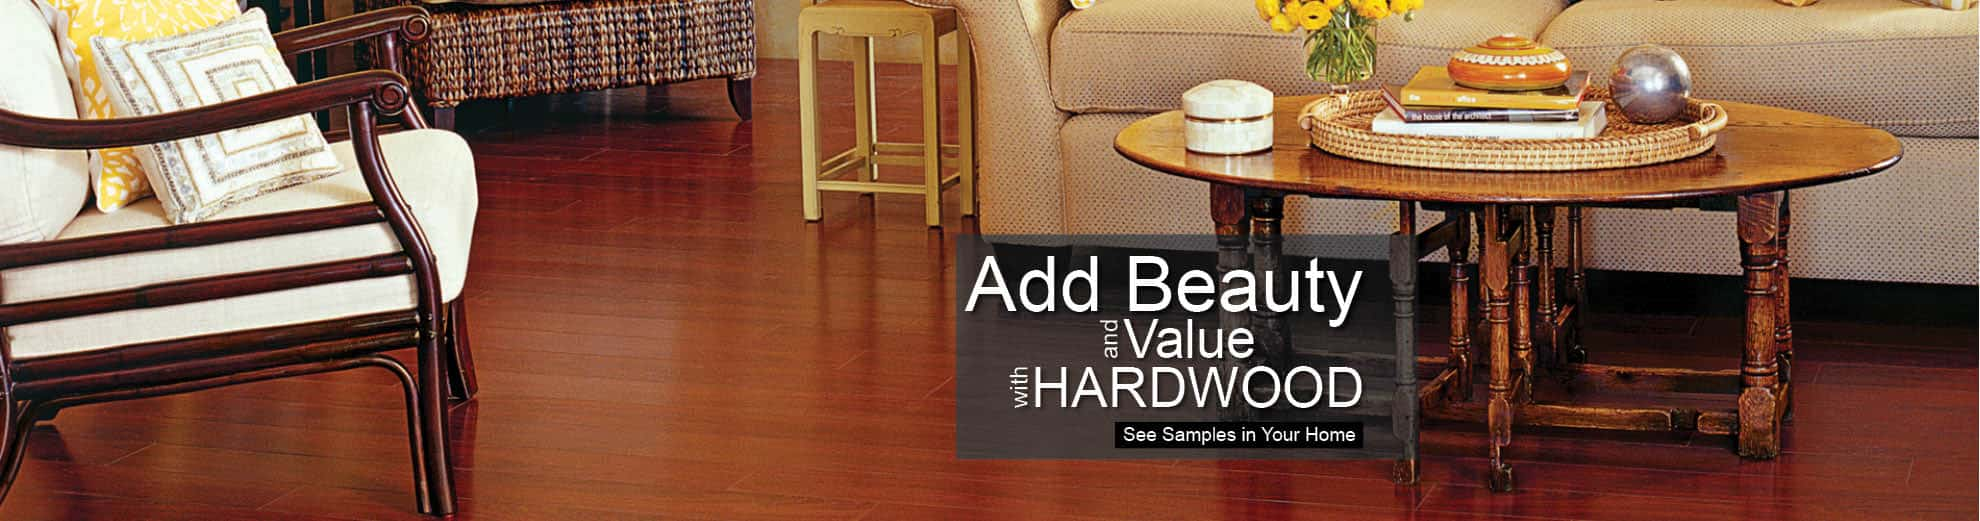 hardwood 1d 150